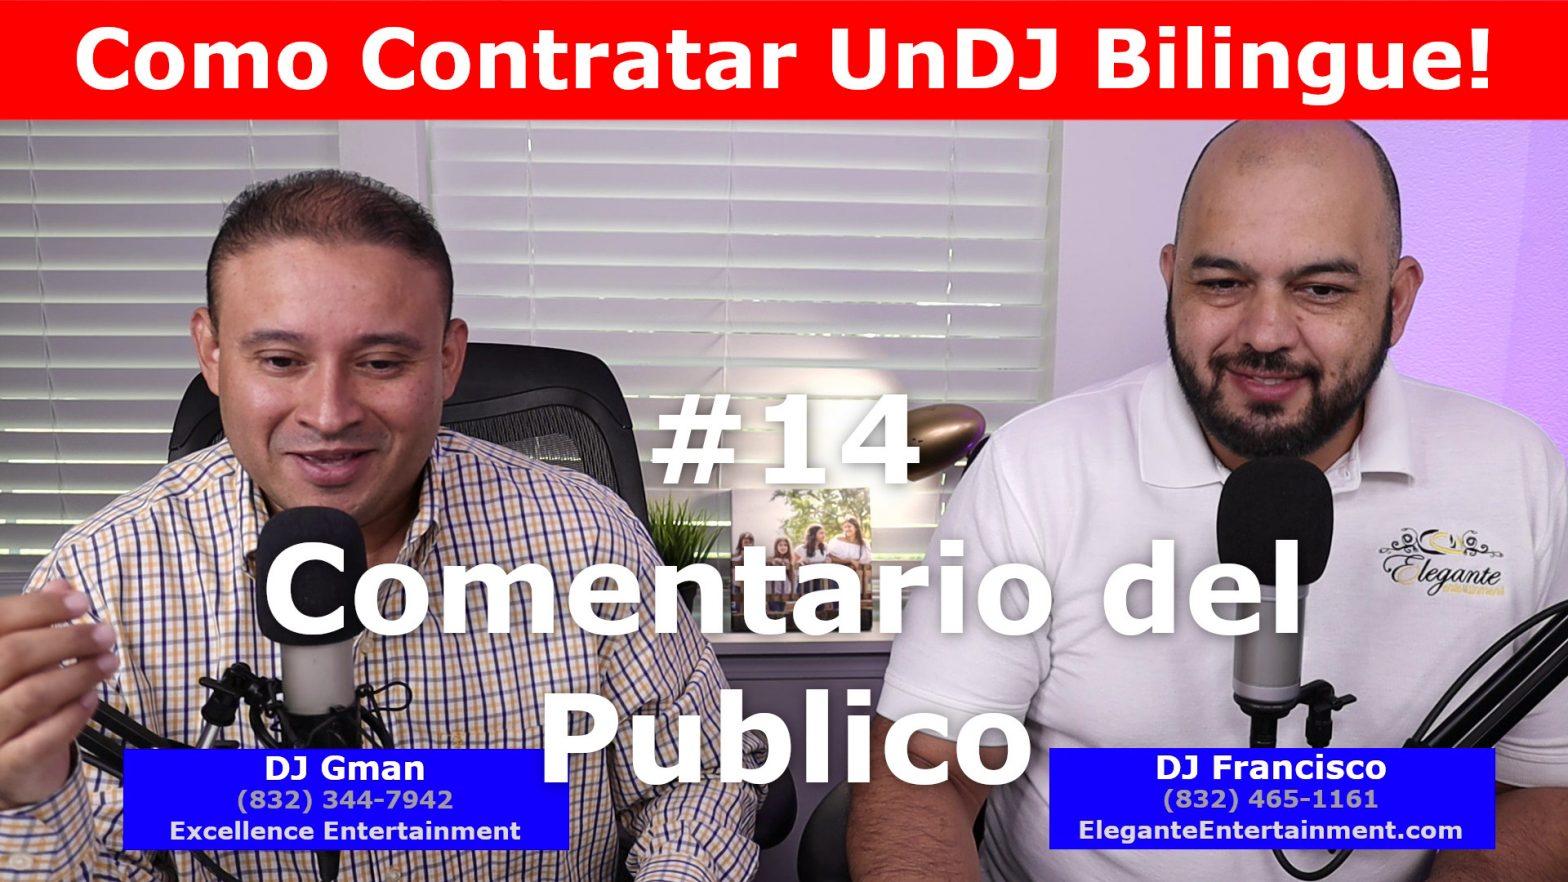 DJ in Houston   #13 Public Comment